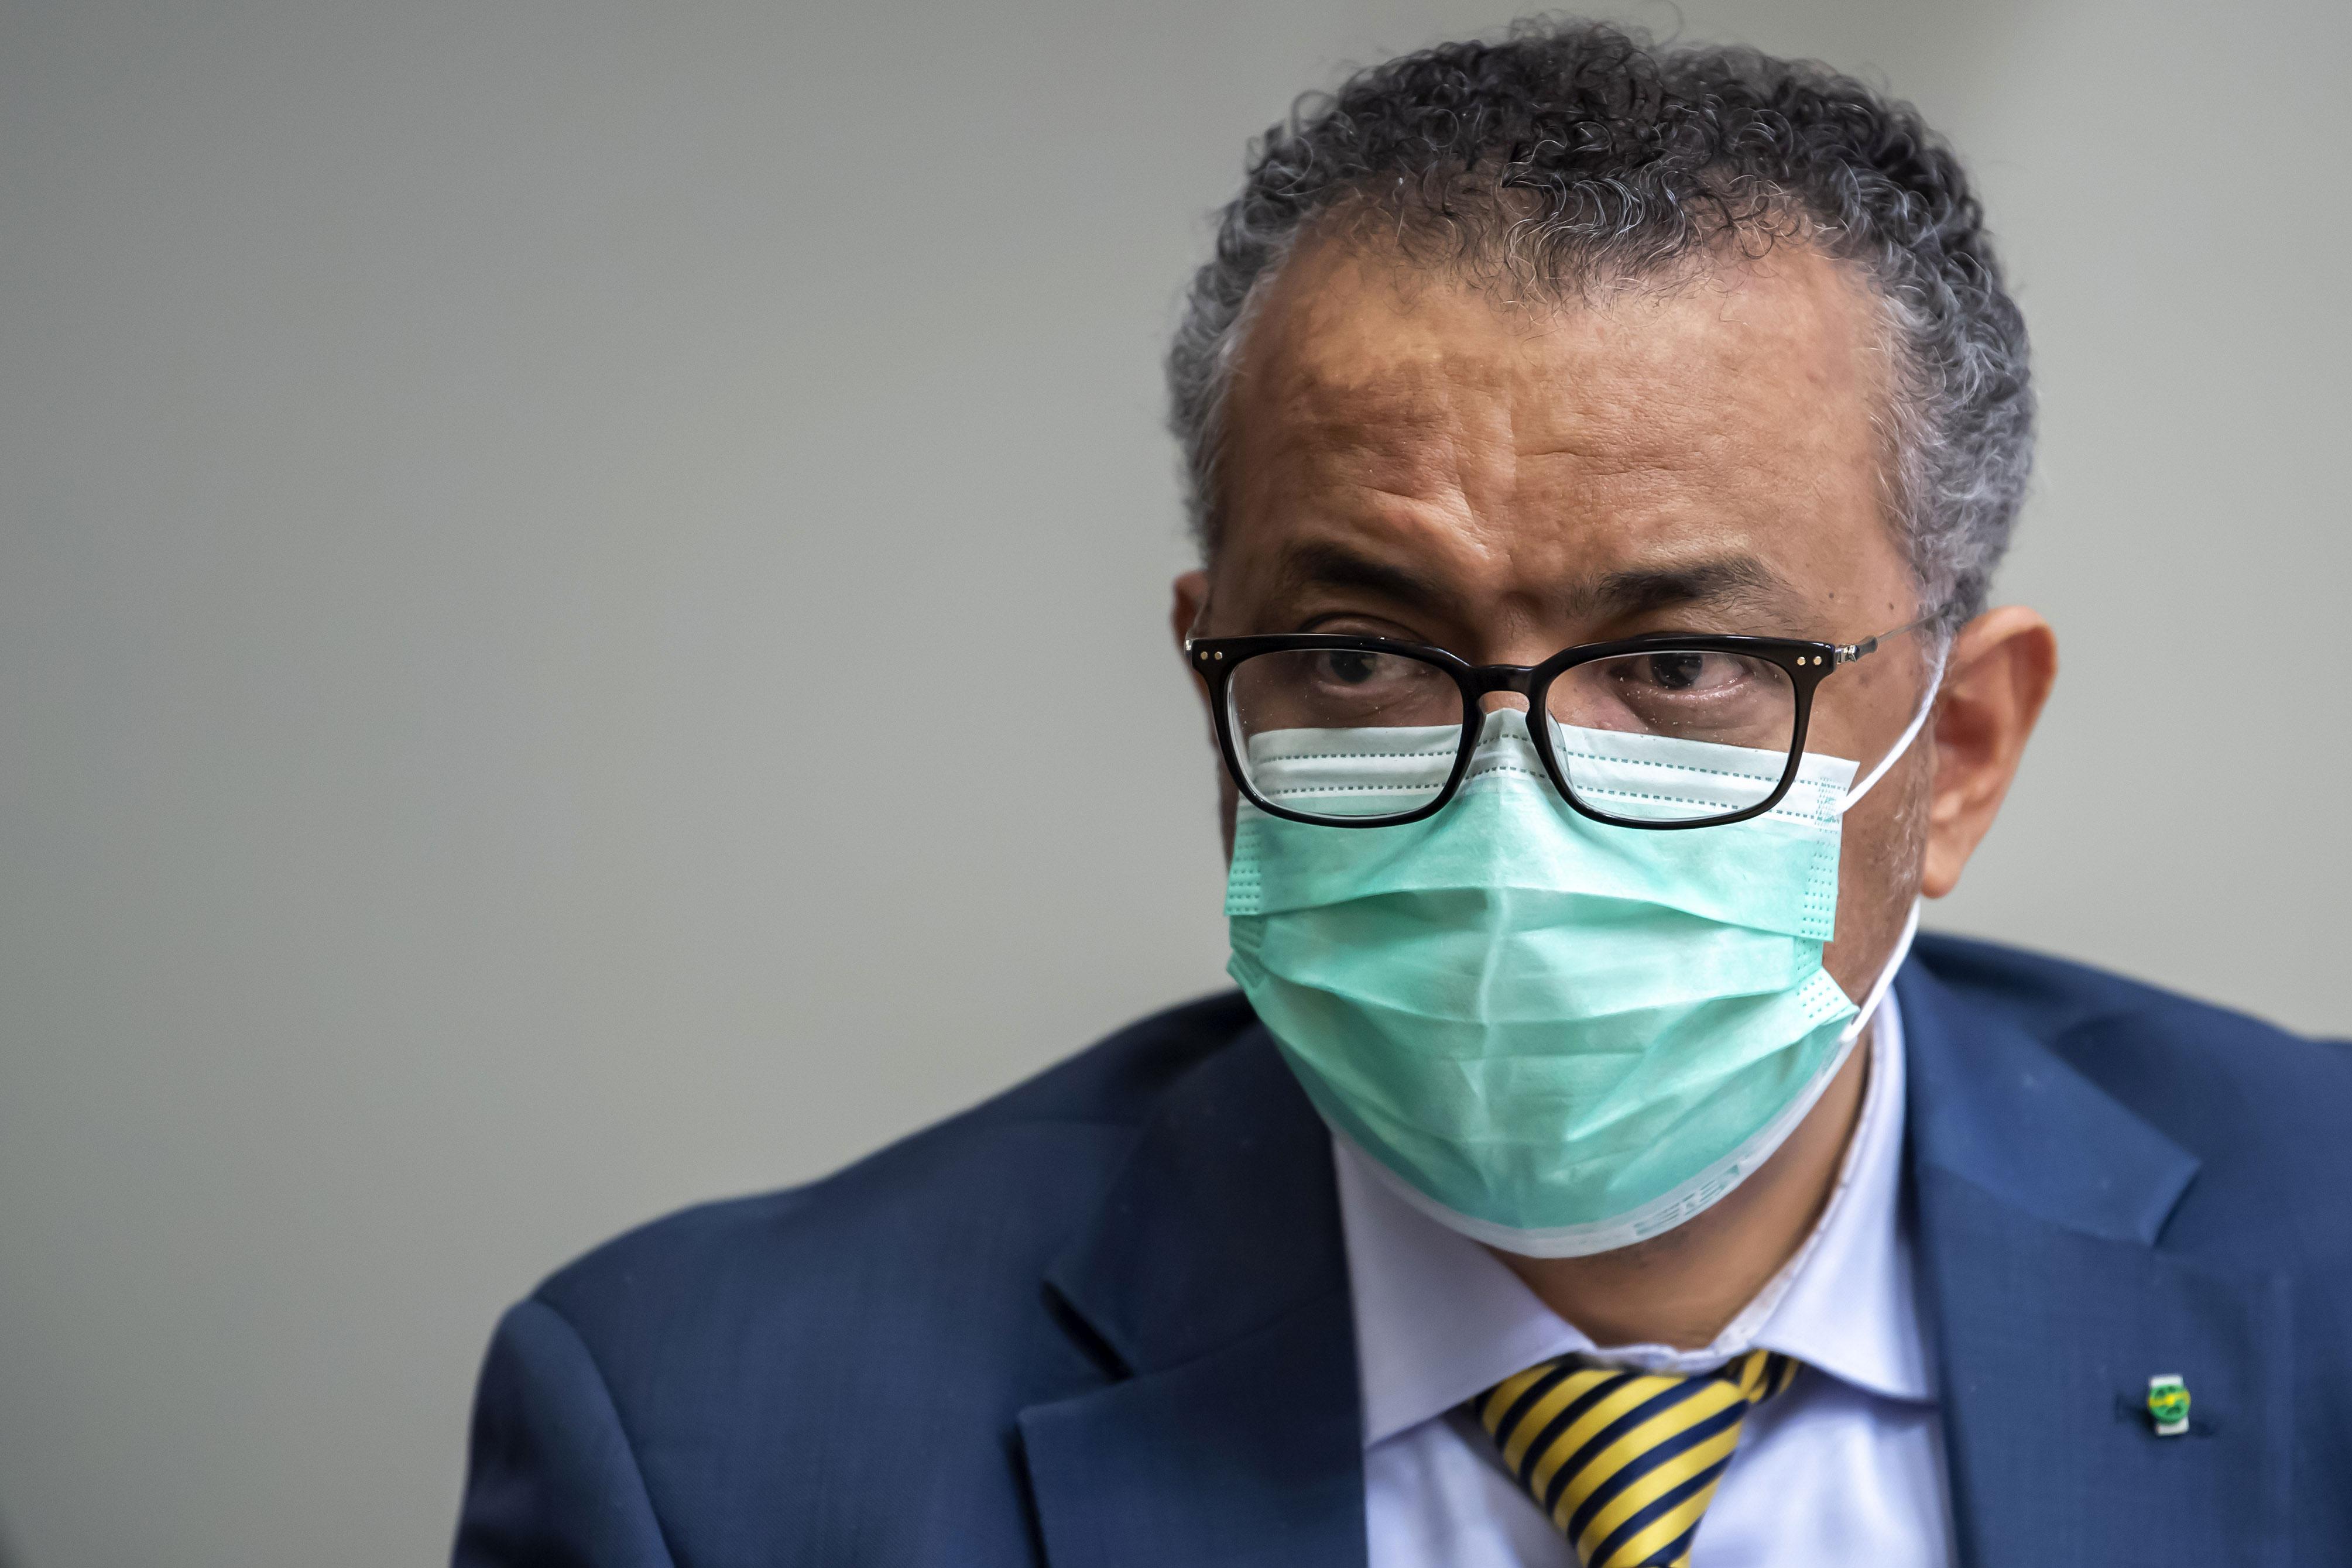 Tedros Adhanom Ghebreyesus, director-general of the World Health Organization, speaks in Geneva, Switzerland, on October 15.